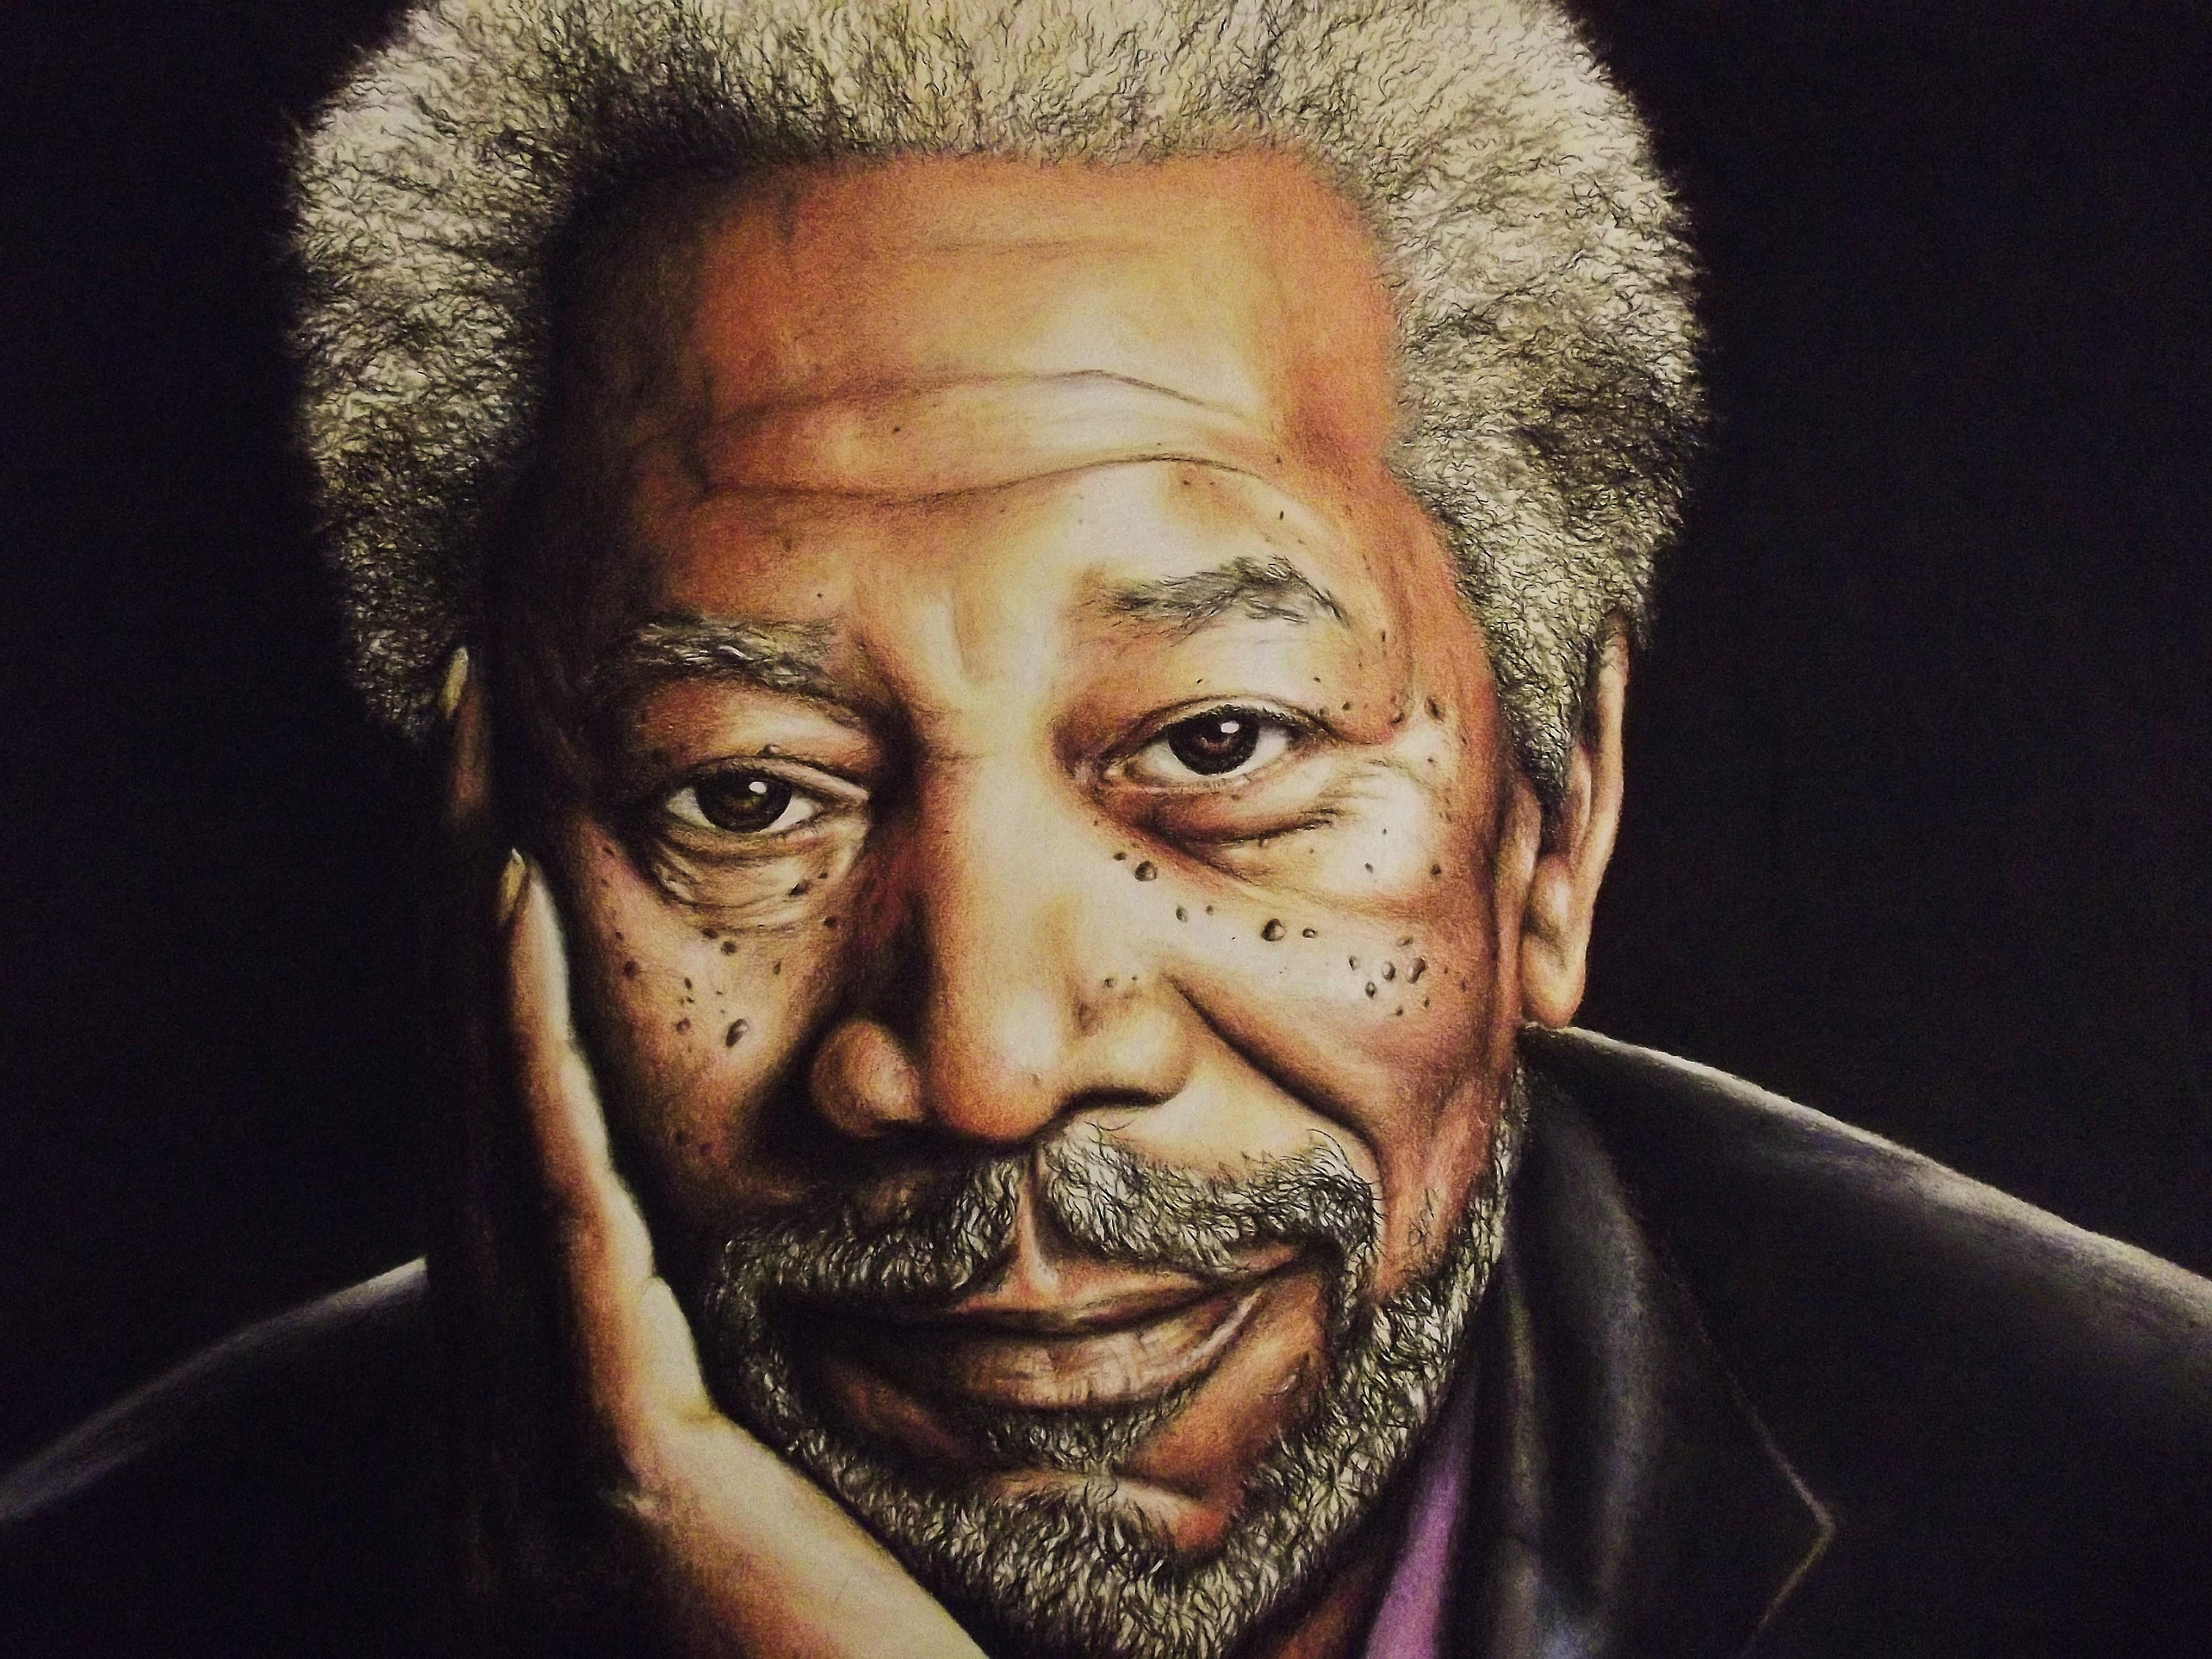 63 Morgan Freeman HD Wallpapers | Backgrounds - Wallpaper Abyss